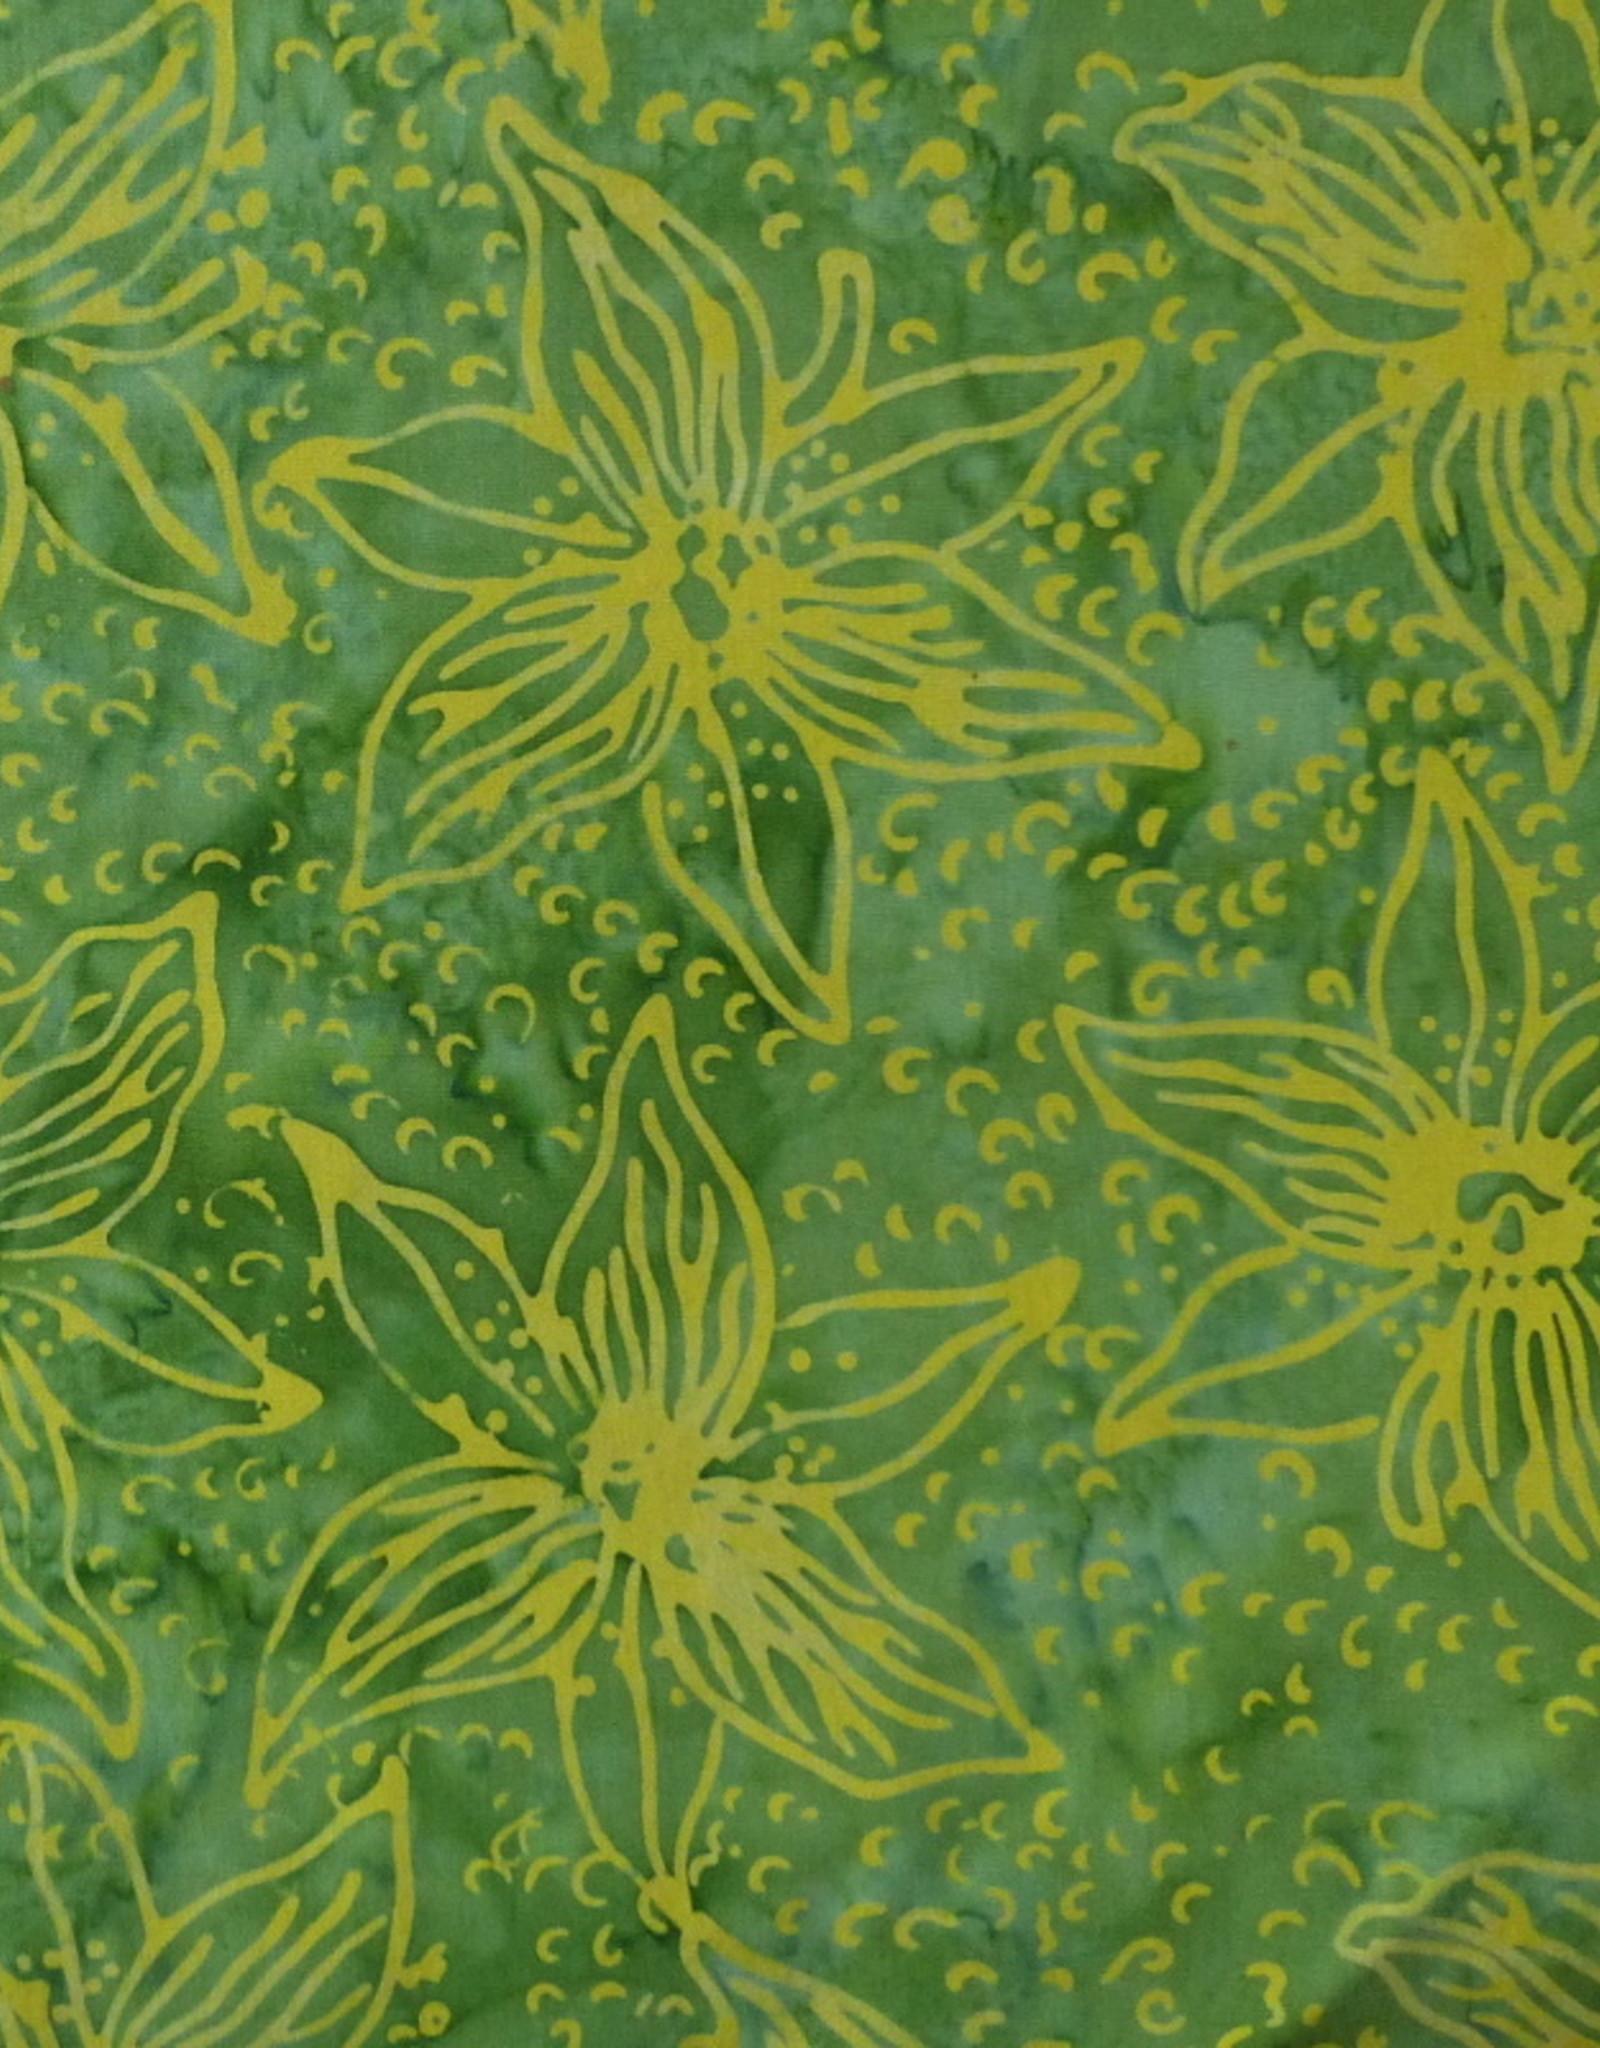 Diverse 10 cm Batik Blumen gruen gelb